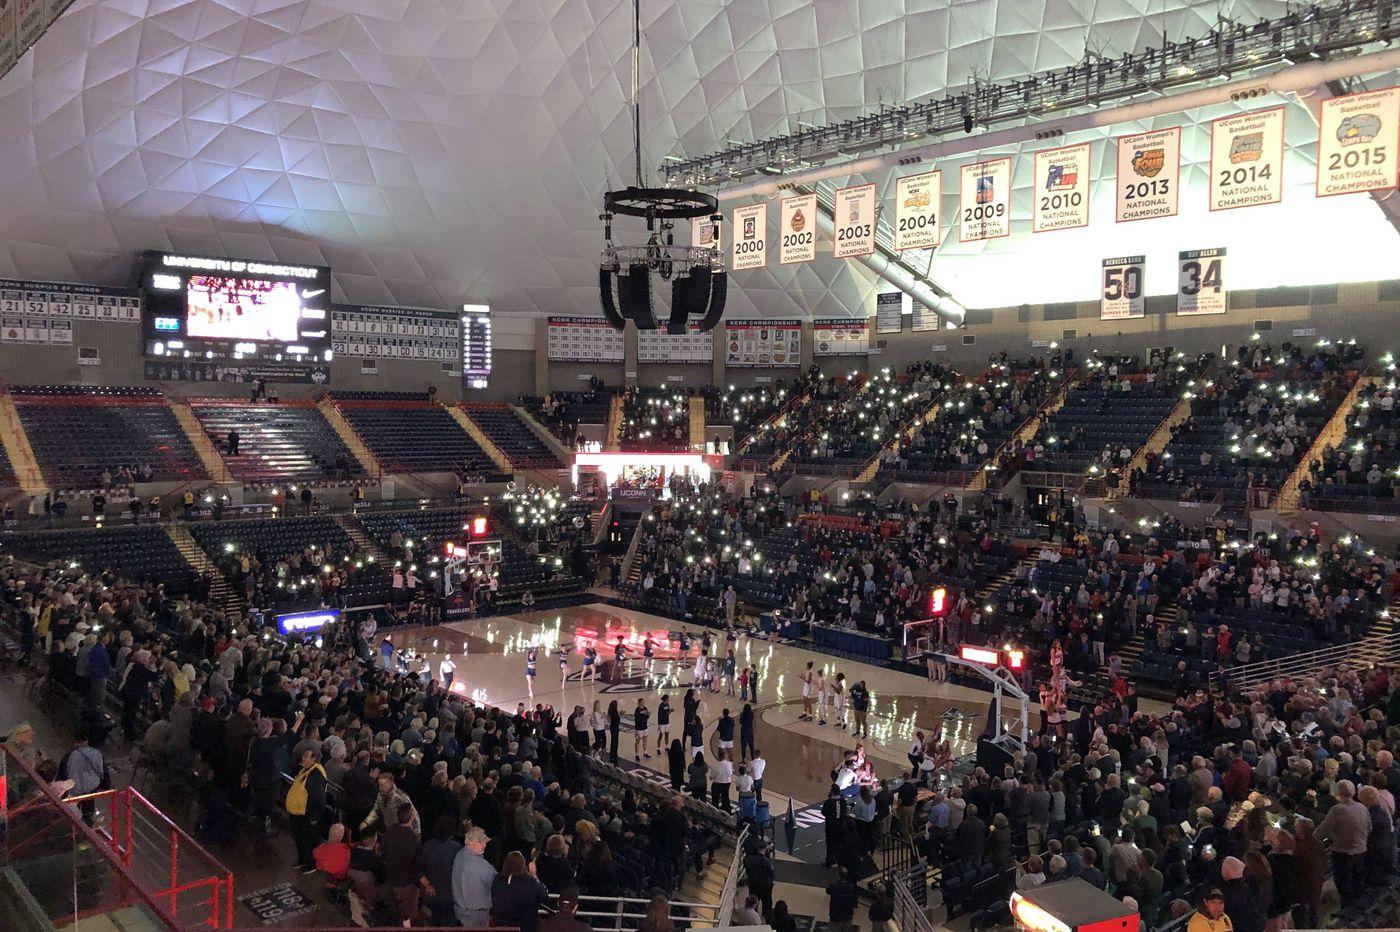 Jefferson University women's basketball hits the big time in preseason game at UConn | Mike Jensen